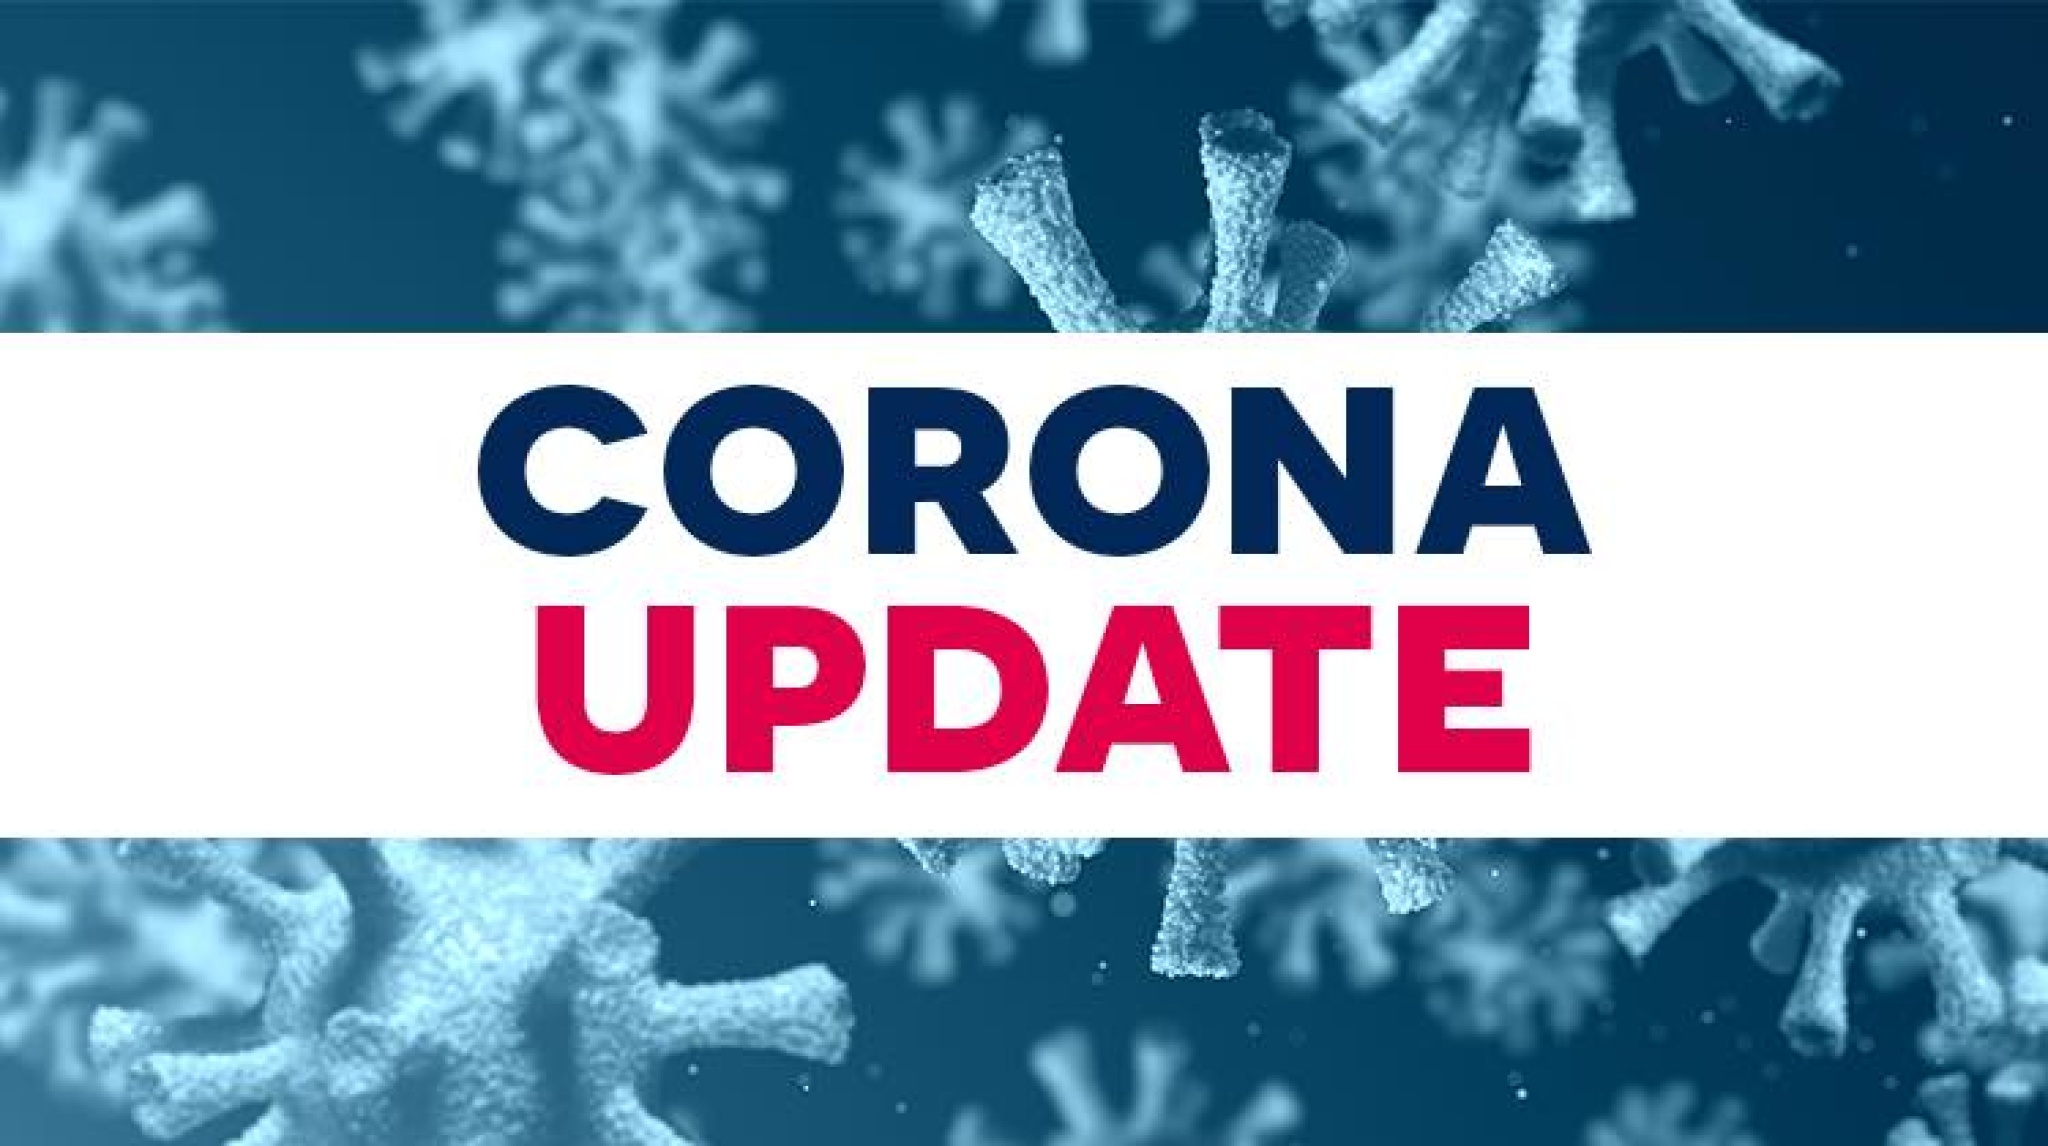 Corona update - Showroom weer geopend!-2021-09-08 20:08:52